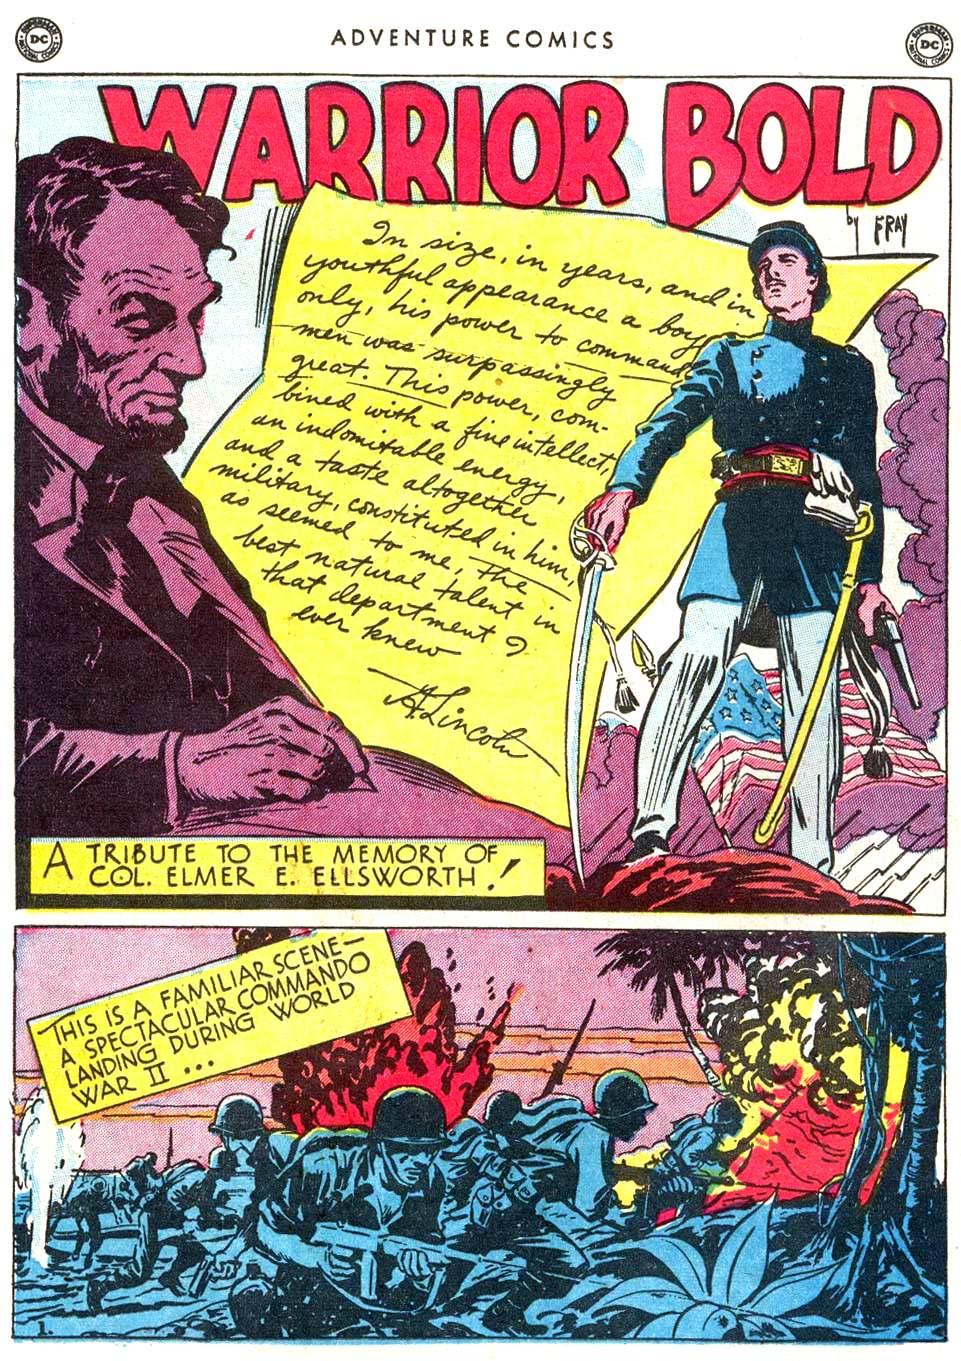 Read online Adventure Comics (1938) comic -  Issue #156 - 32